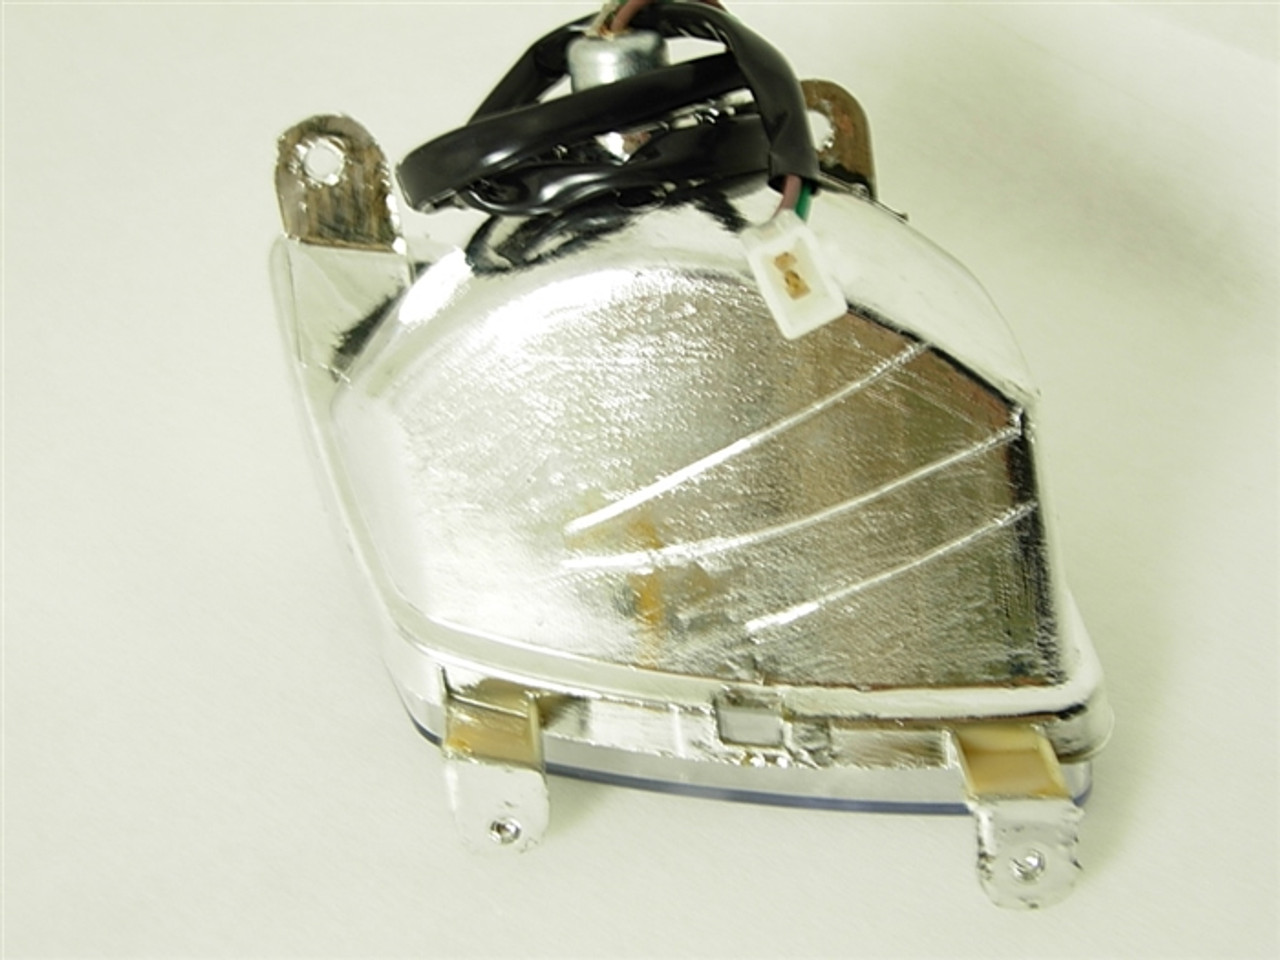 headlight assembly (left side) 11351-a76-1